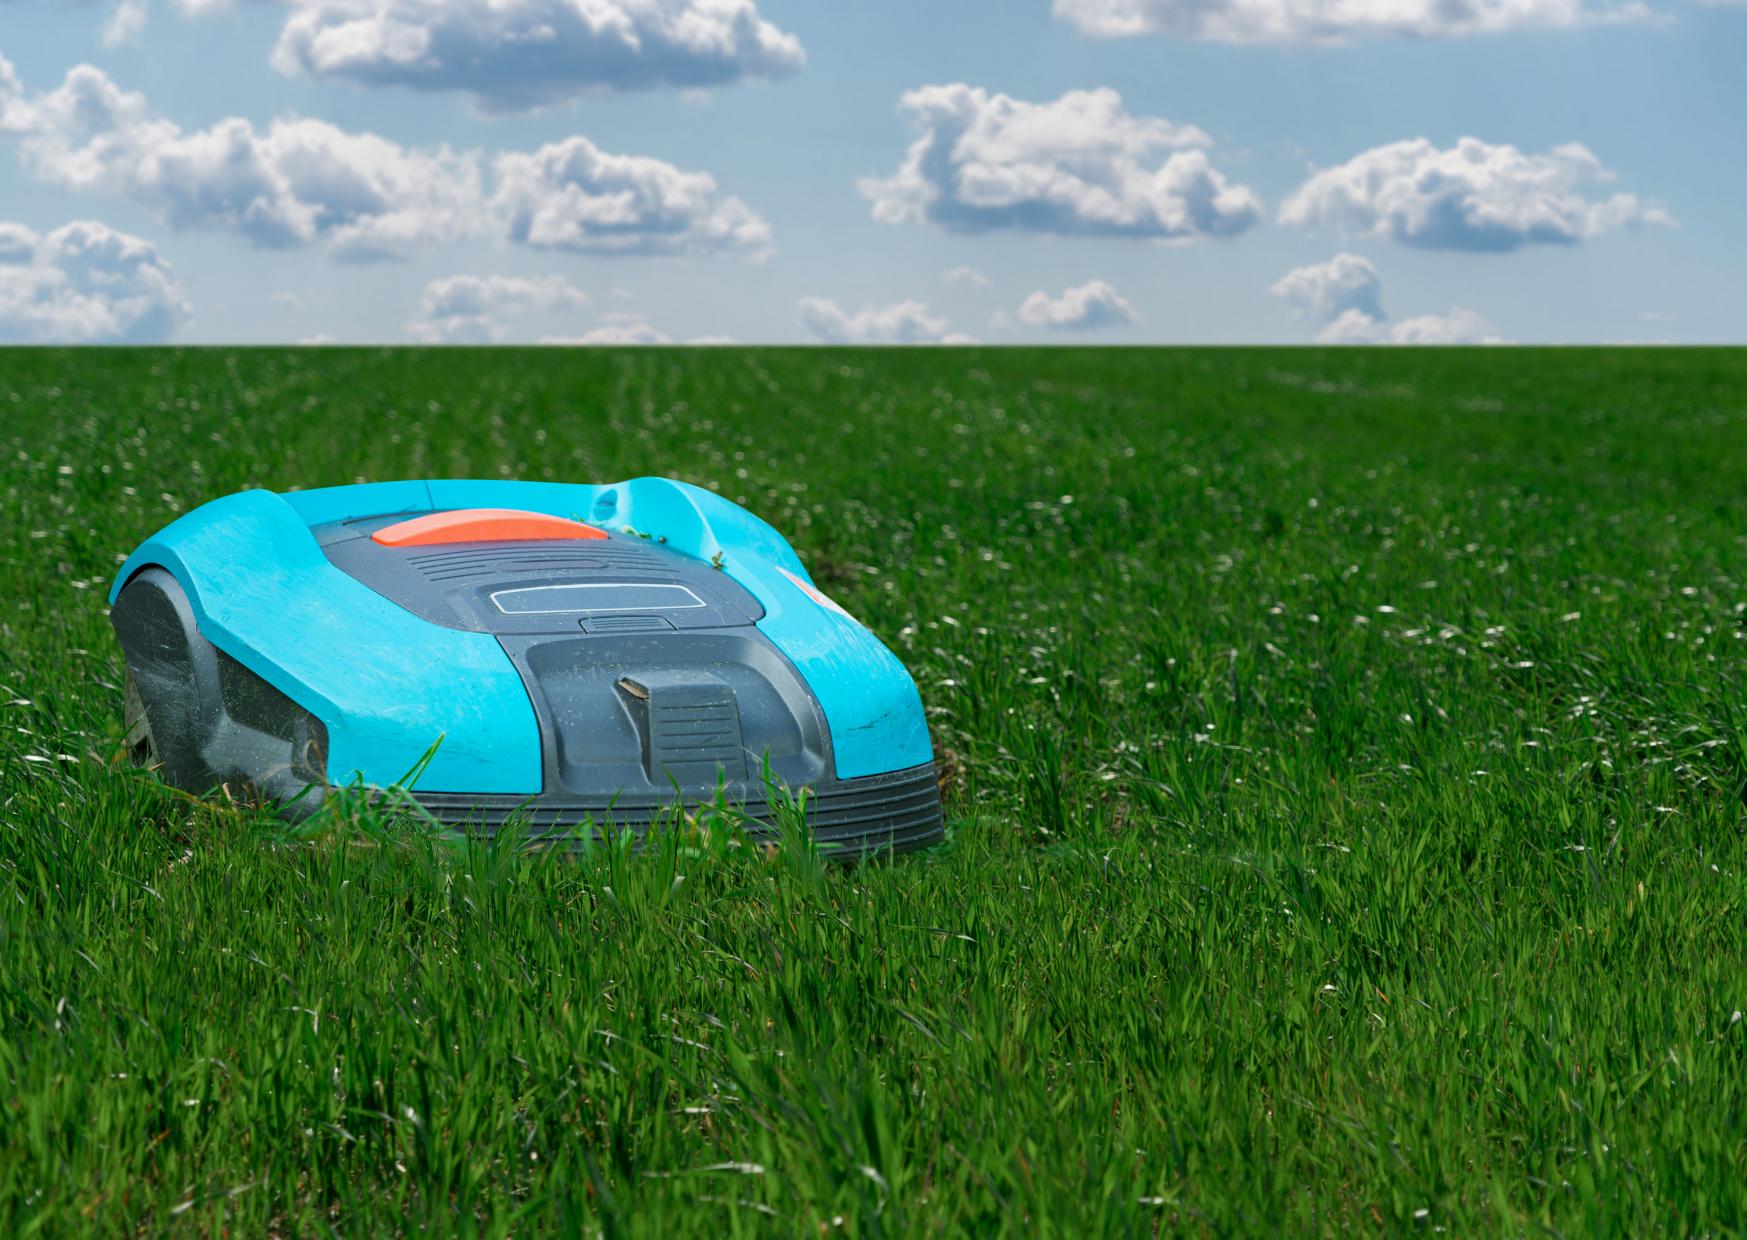 Photo of Smart Robot Lawnmowers